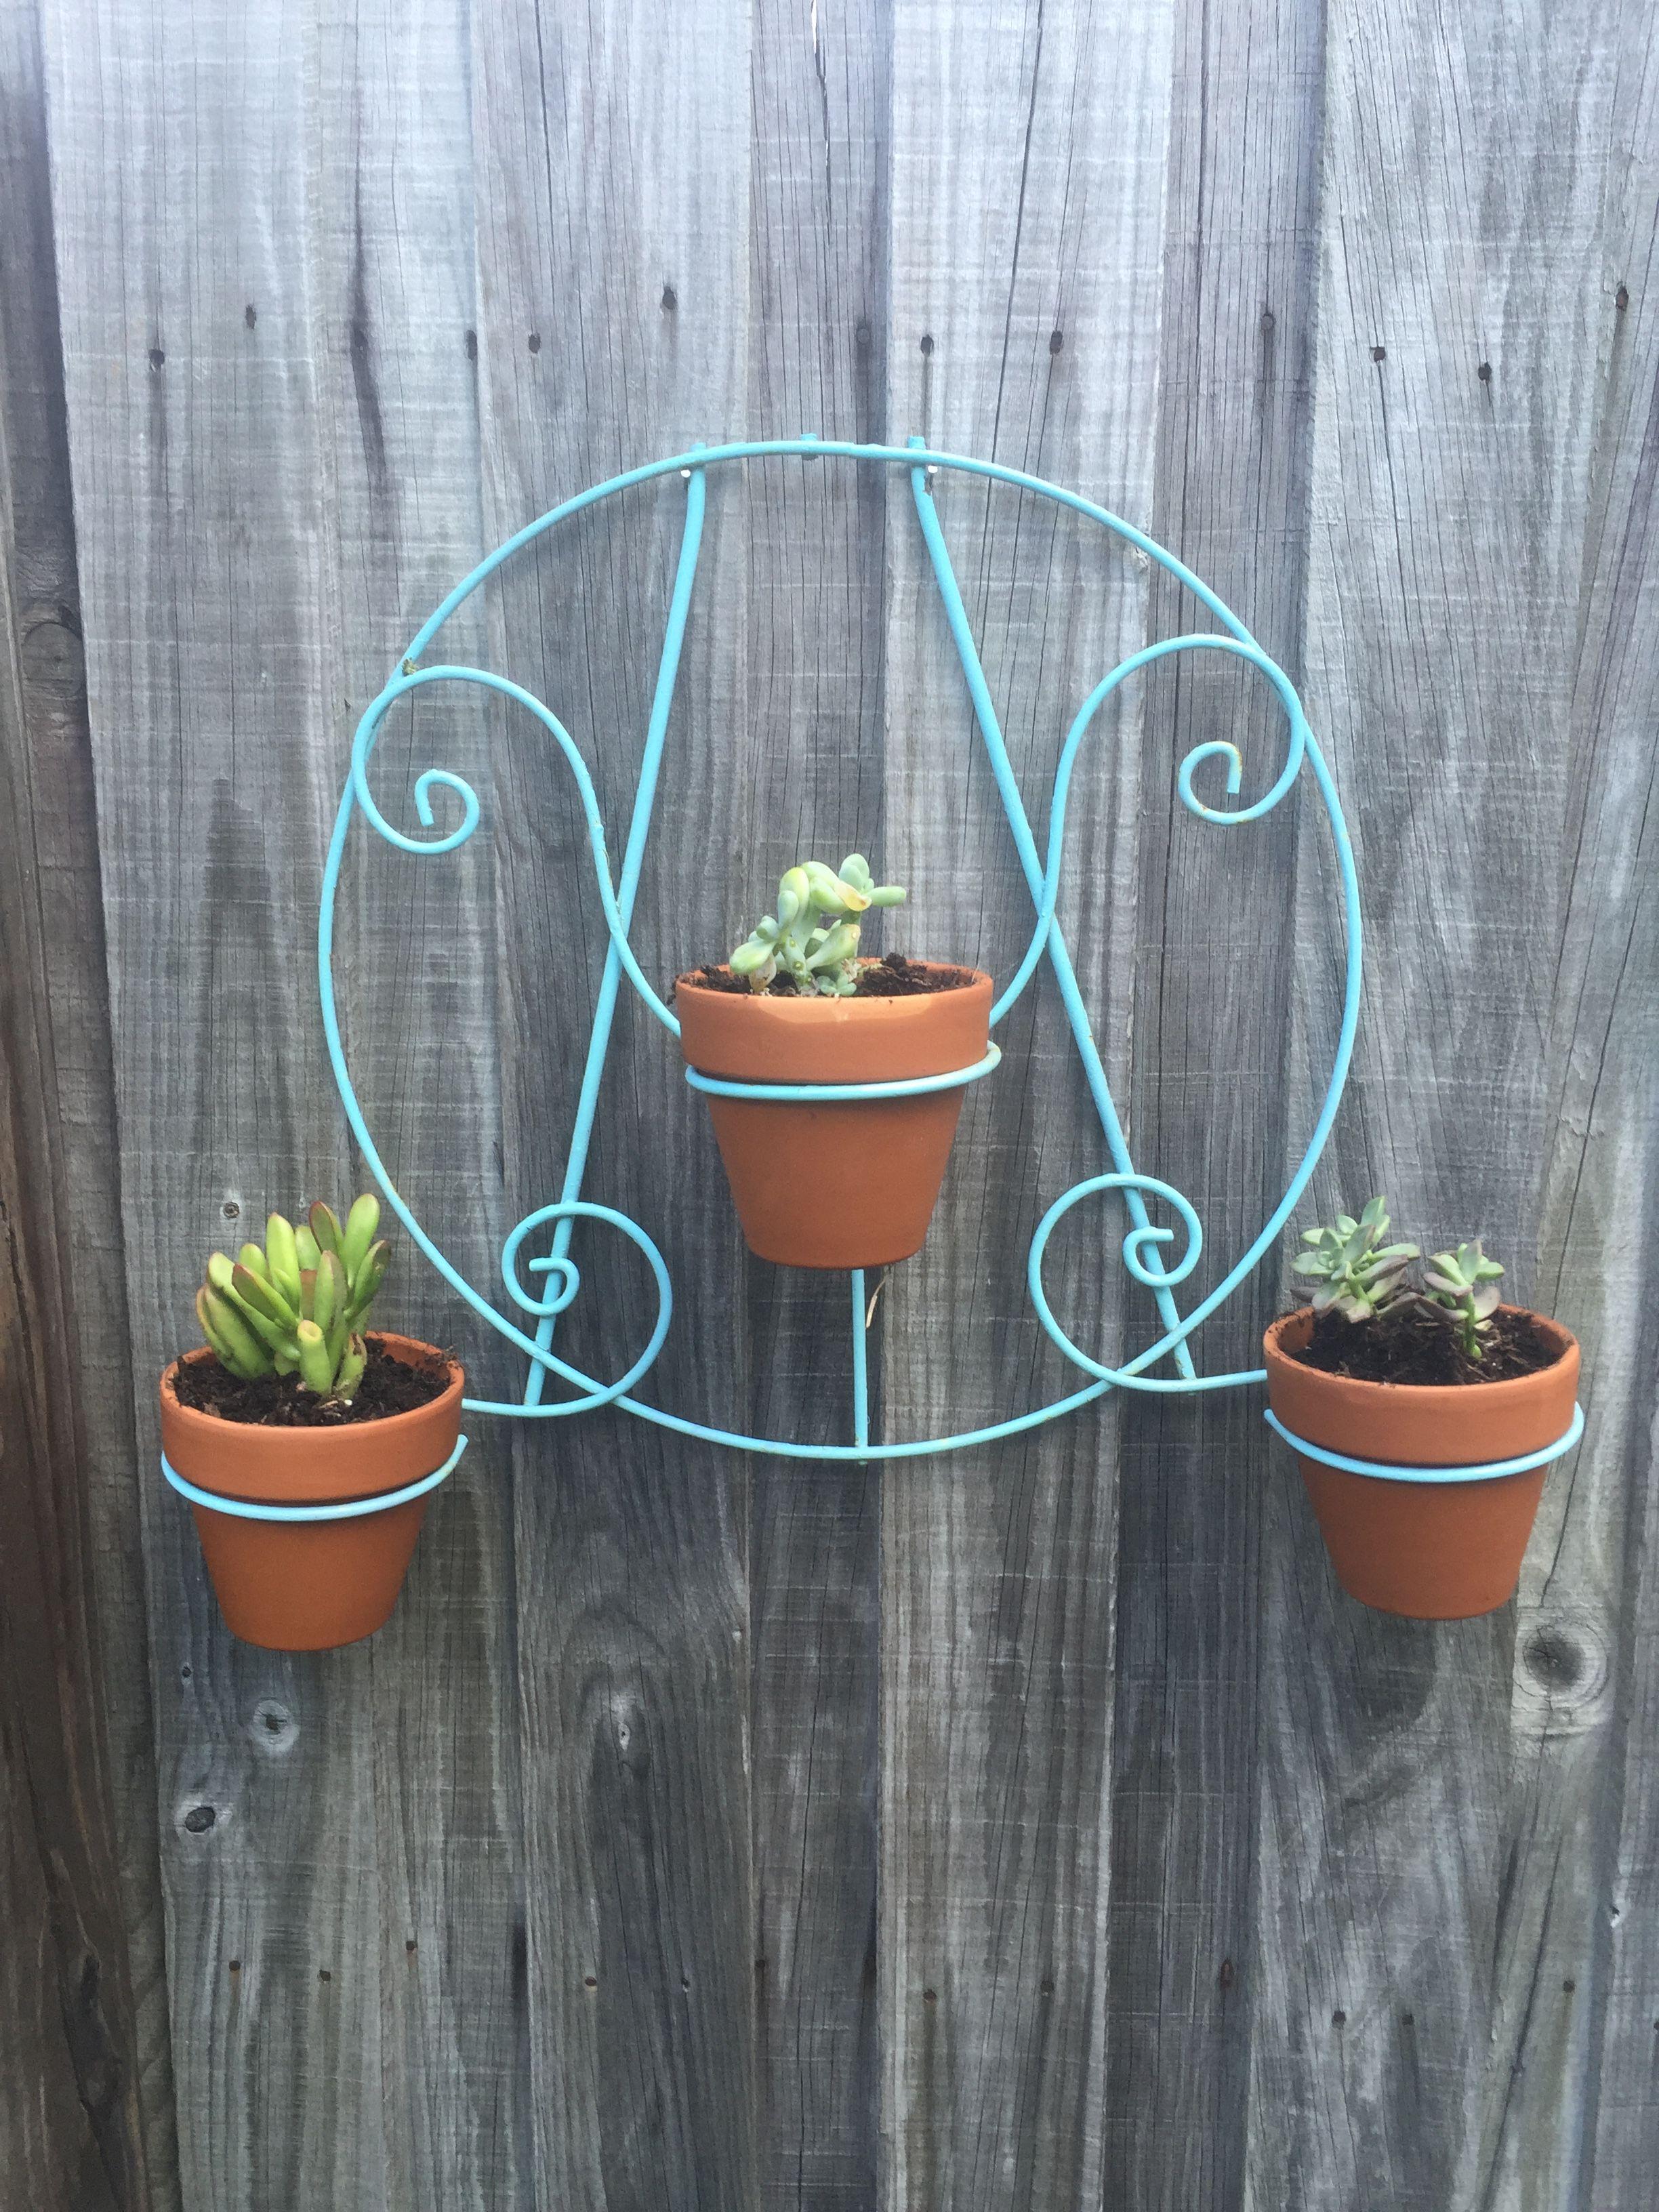 Iron artwork turned planter